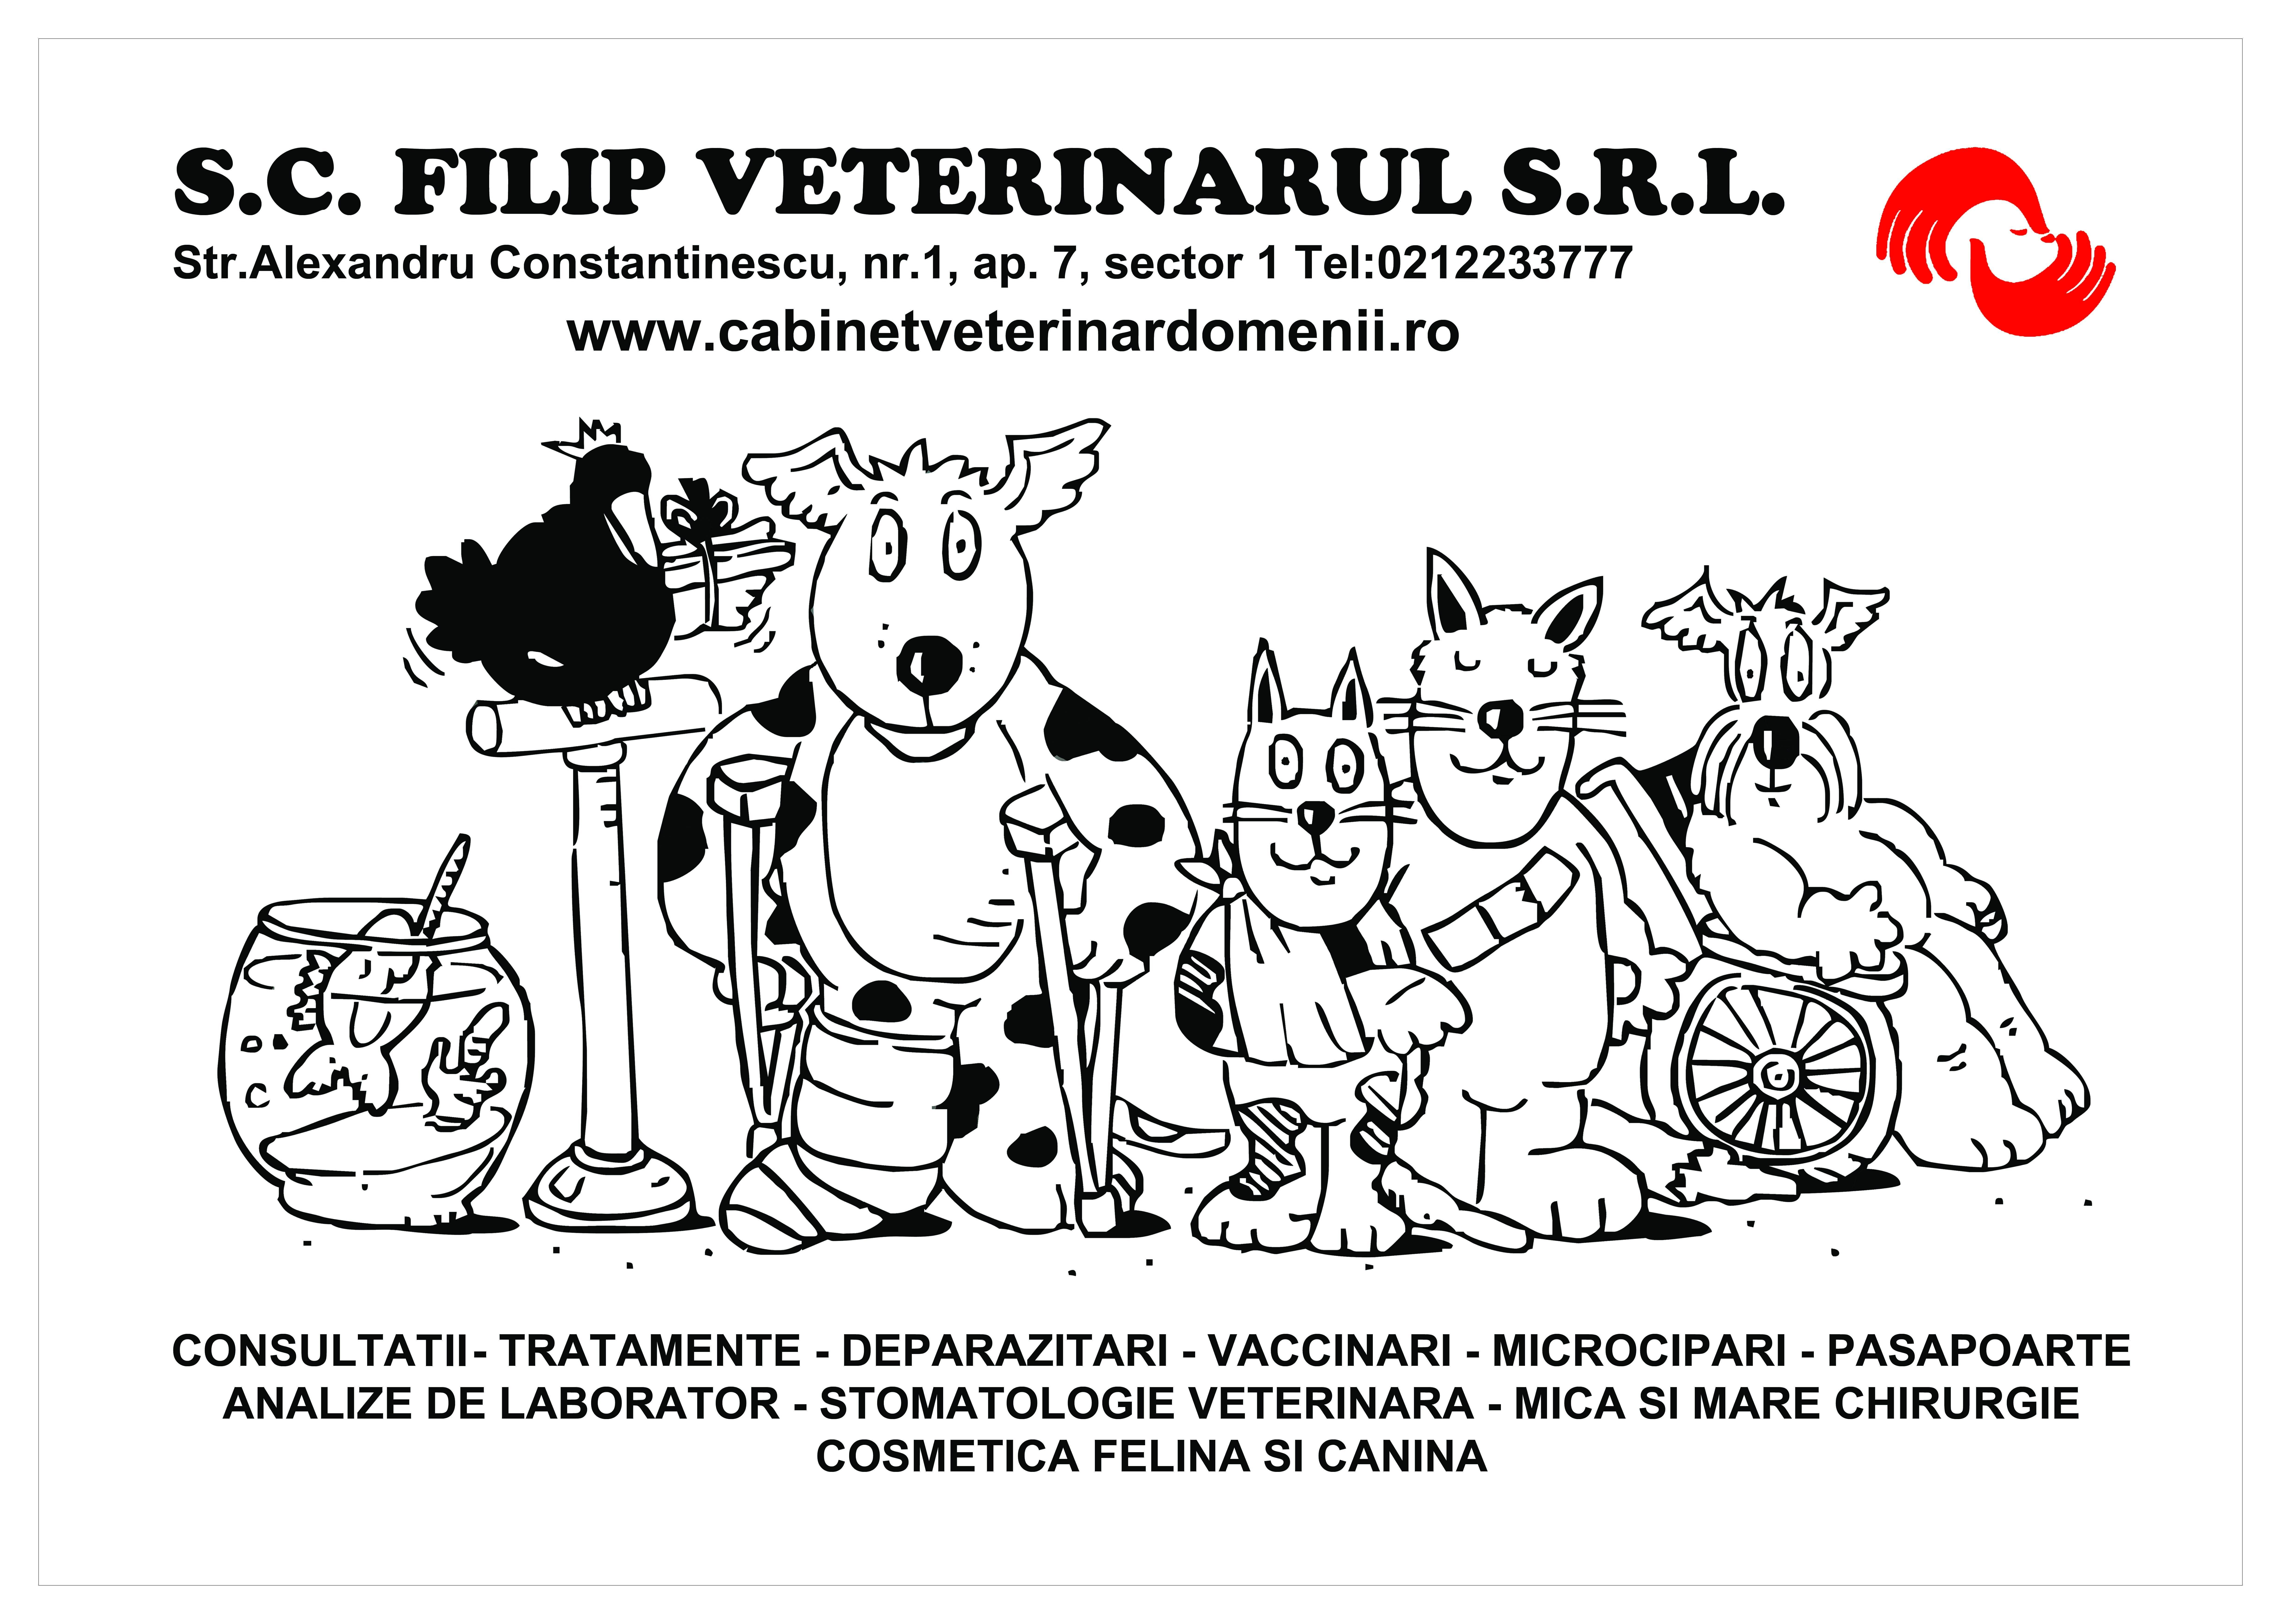 cabinet veterinardomenii logo